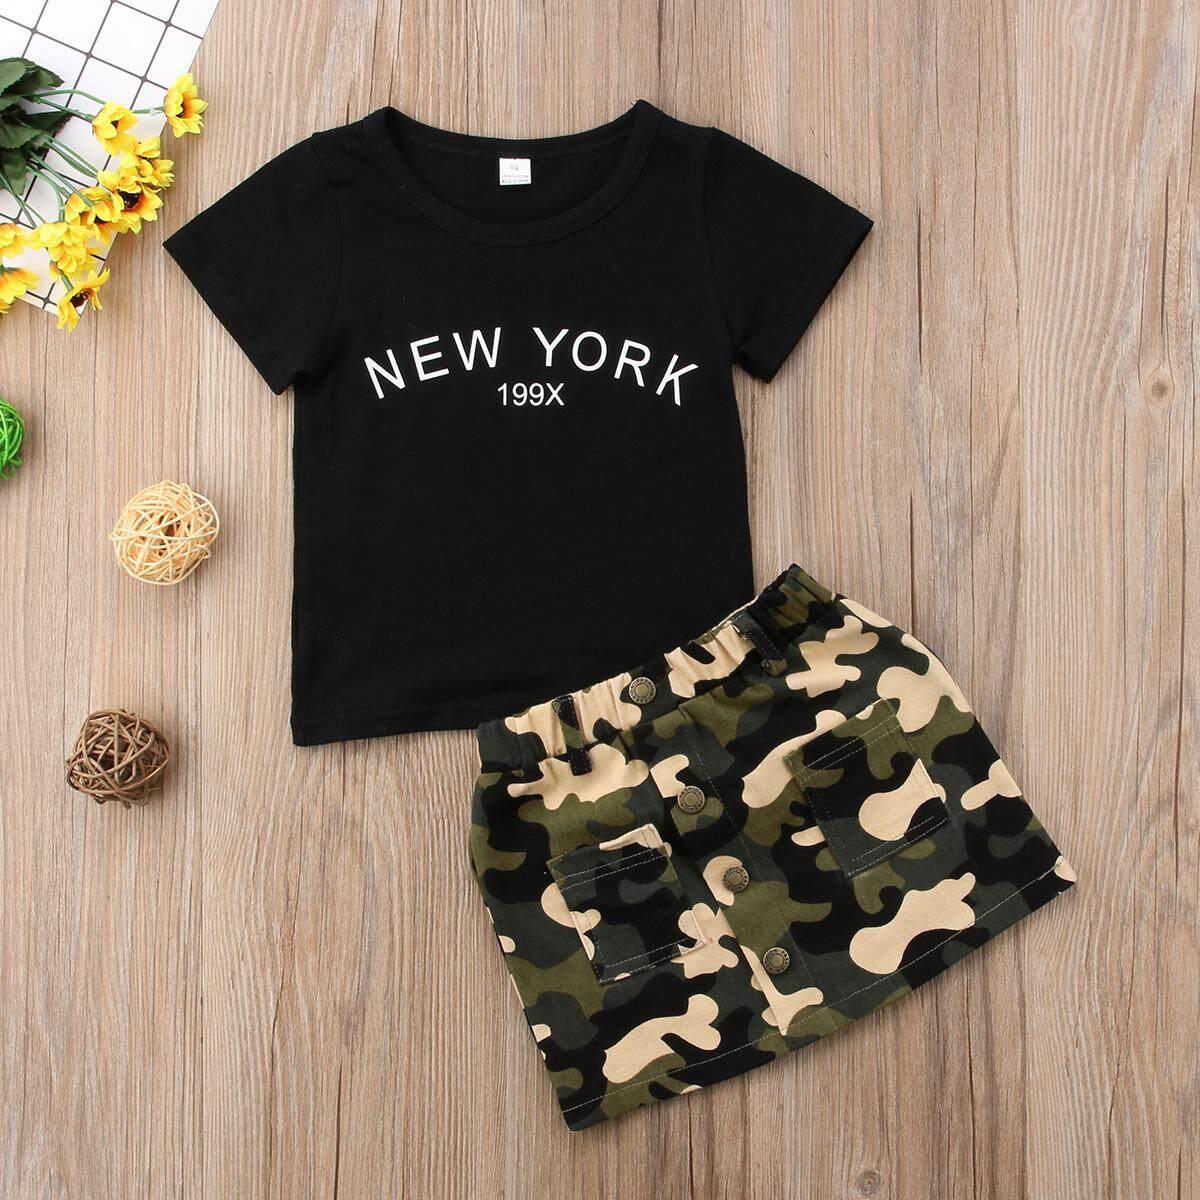 Set Pakaian Bayi Perempuan Terbaik Lazada Kaos Pria Lengan Pendek Cabanna Black Floral Shirt Balita Atasan Camo Rok Kasual 2 Pcs Musim Panas Setelan